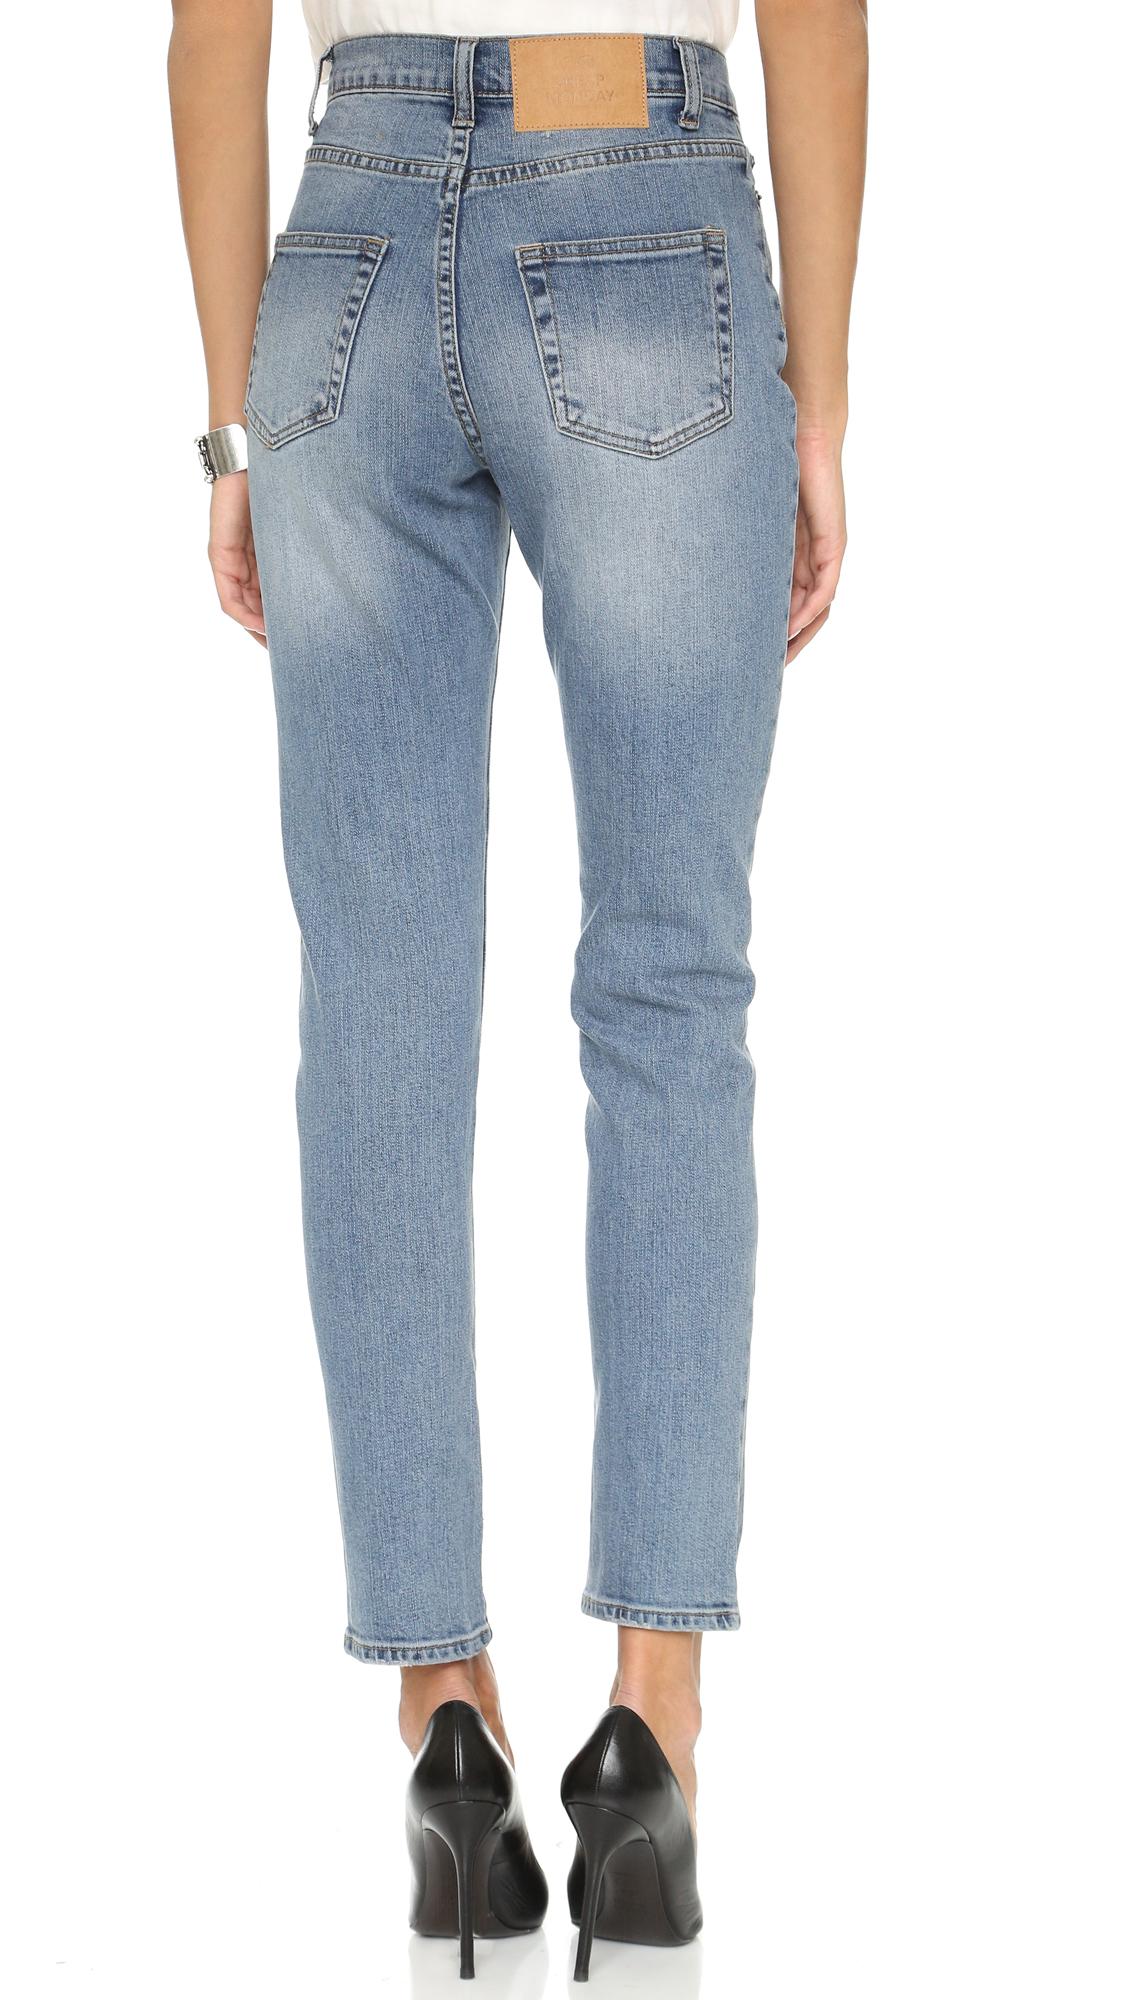 Jeans Donna Monday Shopbop The Cheap WBARnwqx